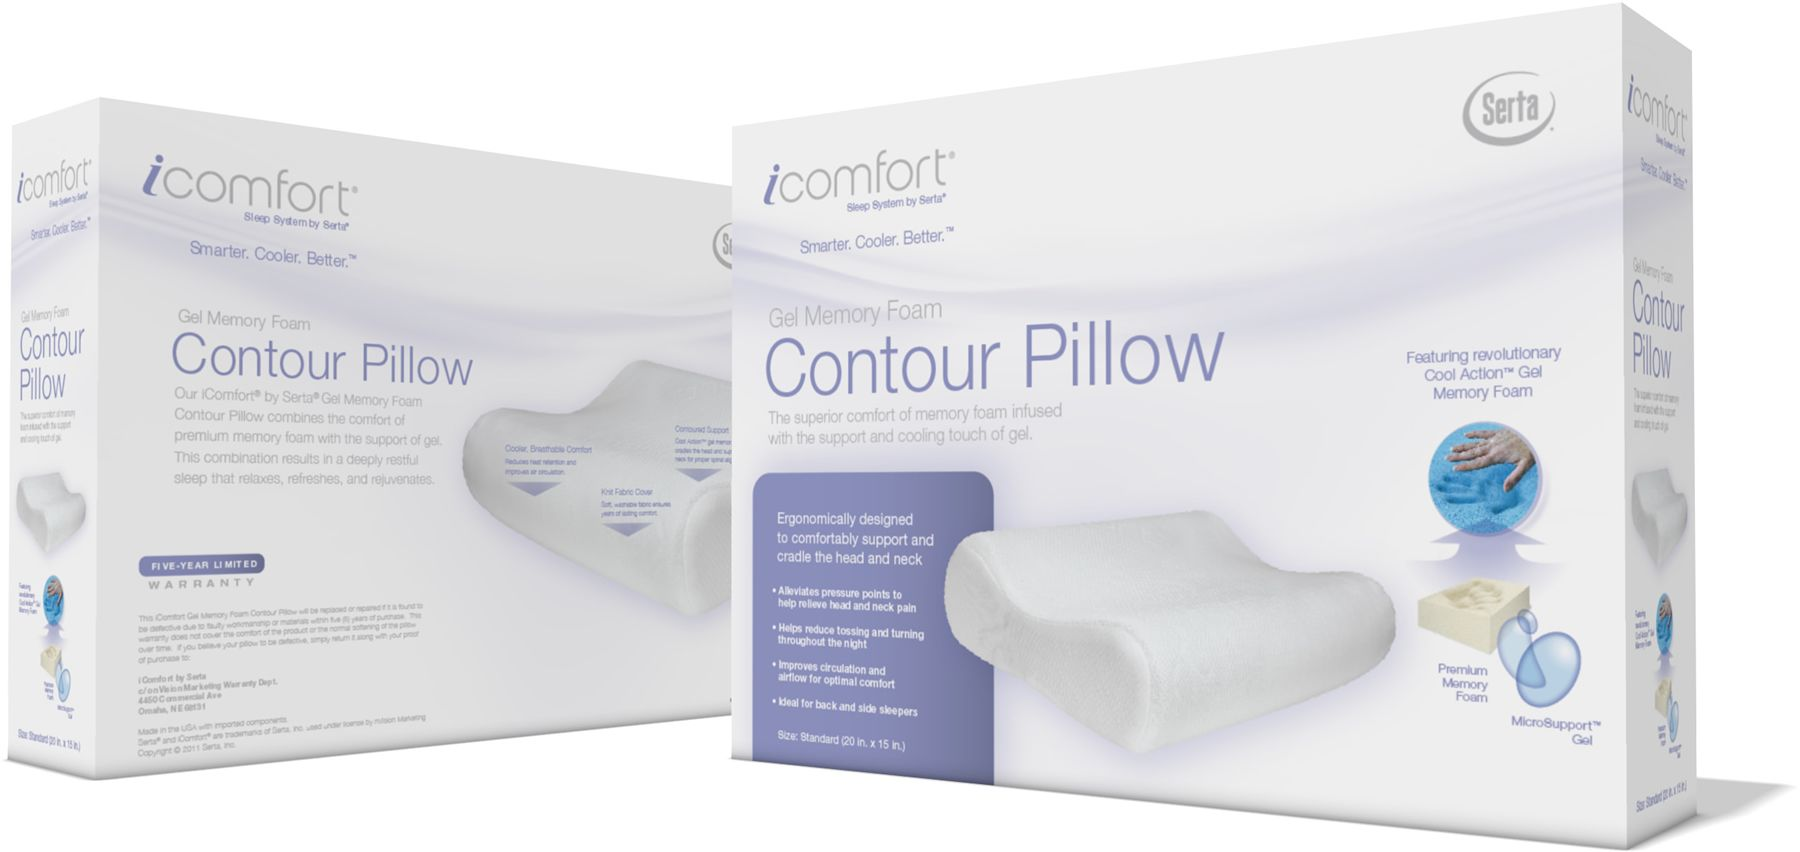 gel memory foam contour pillow